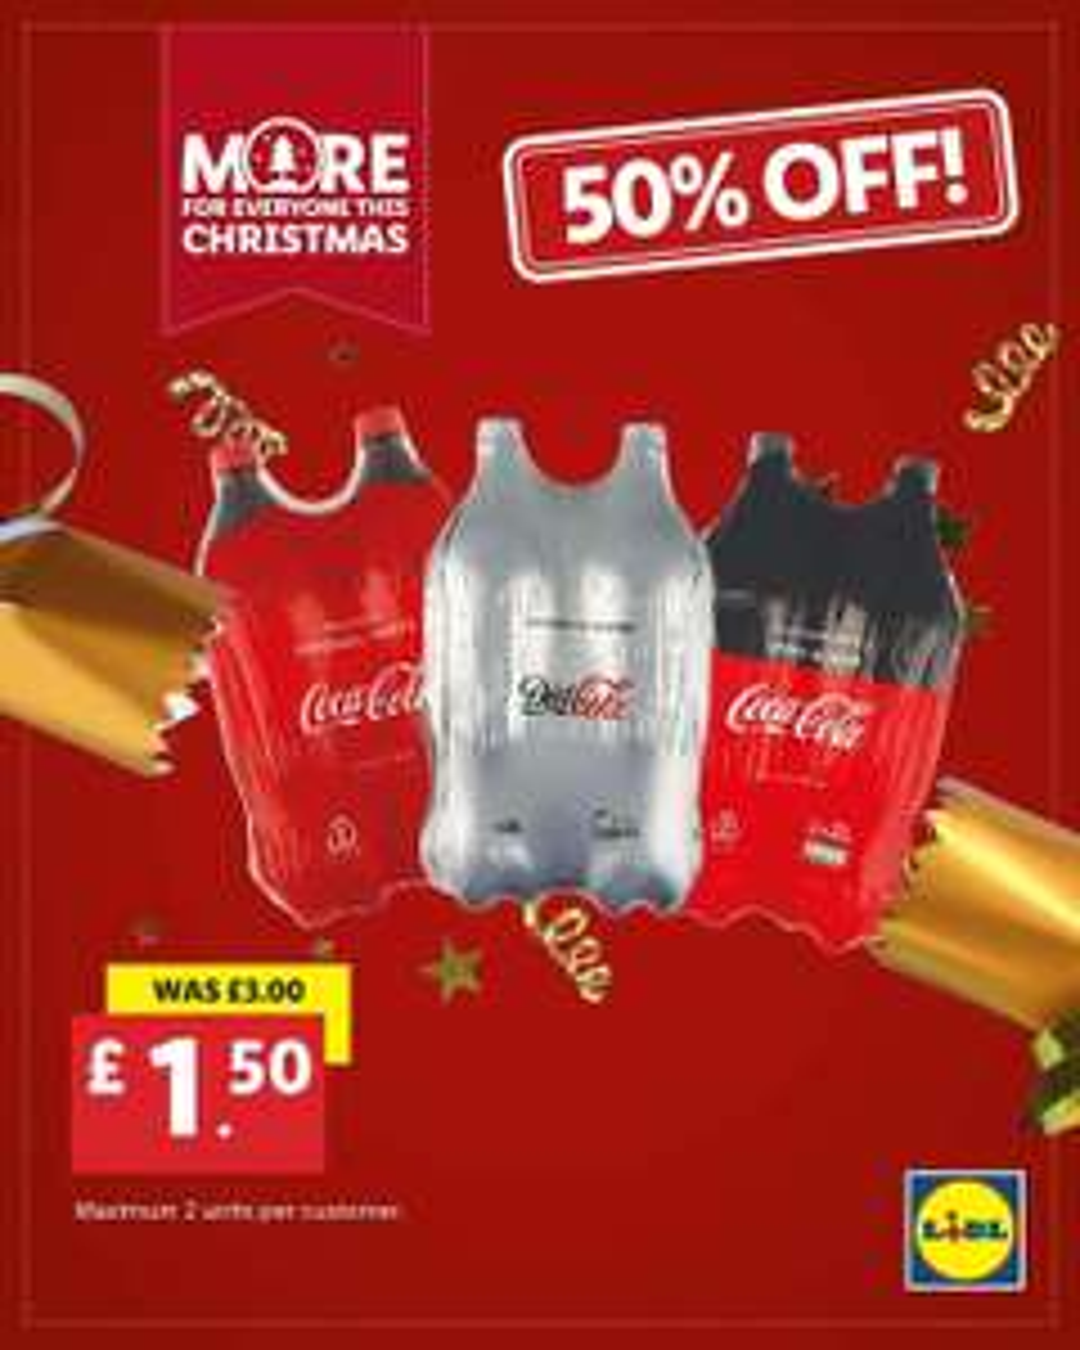 2x 2L Coca Cola, Diet Coke and Coke Zero only £1.50 @ LIDL Northern Ireland